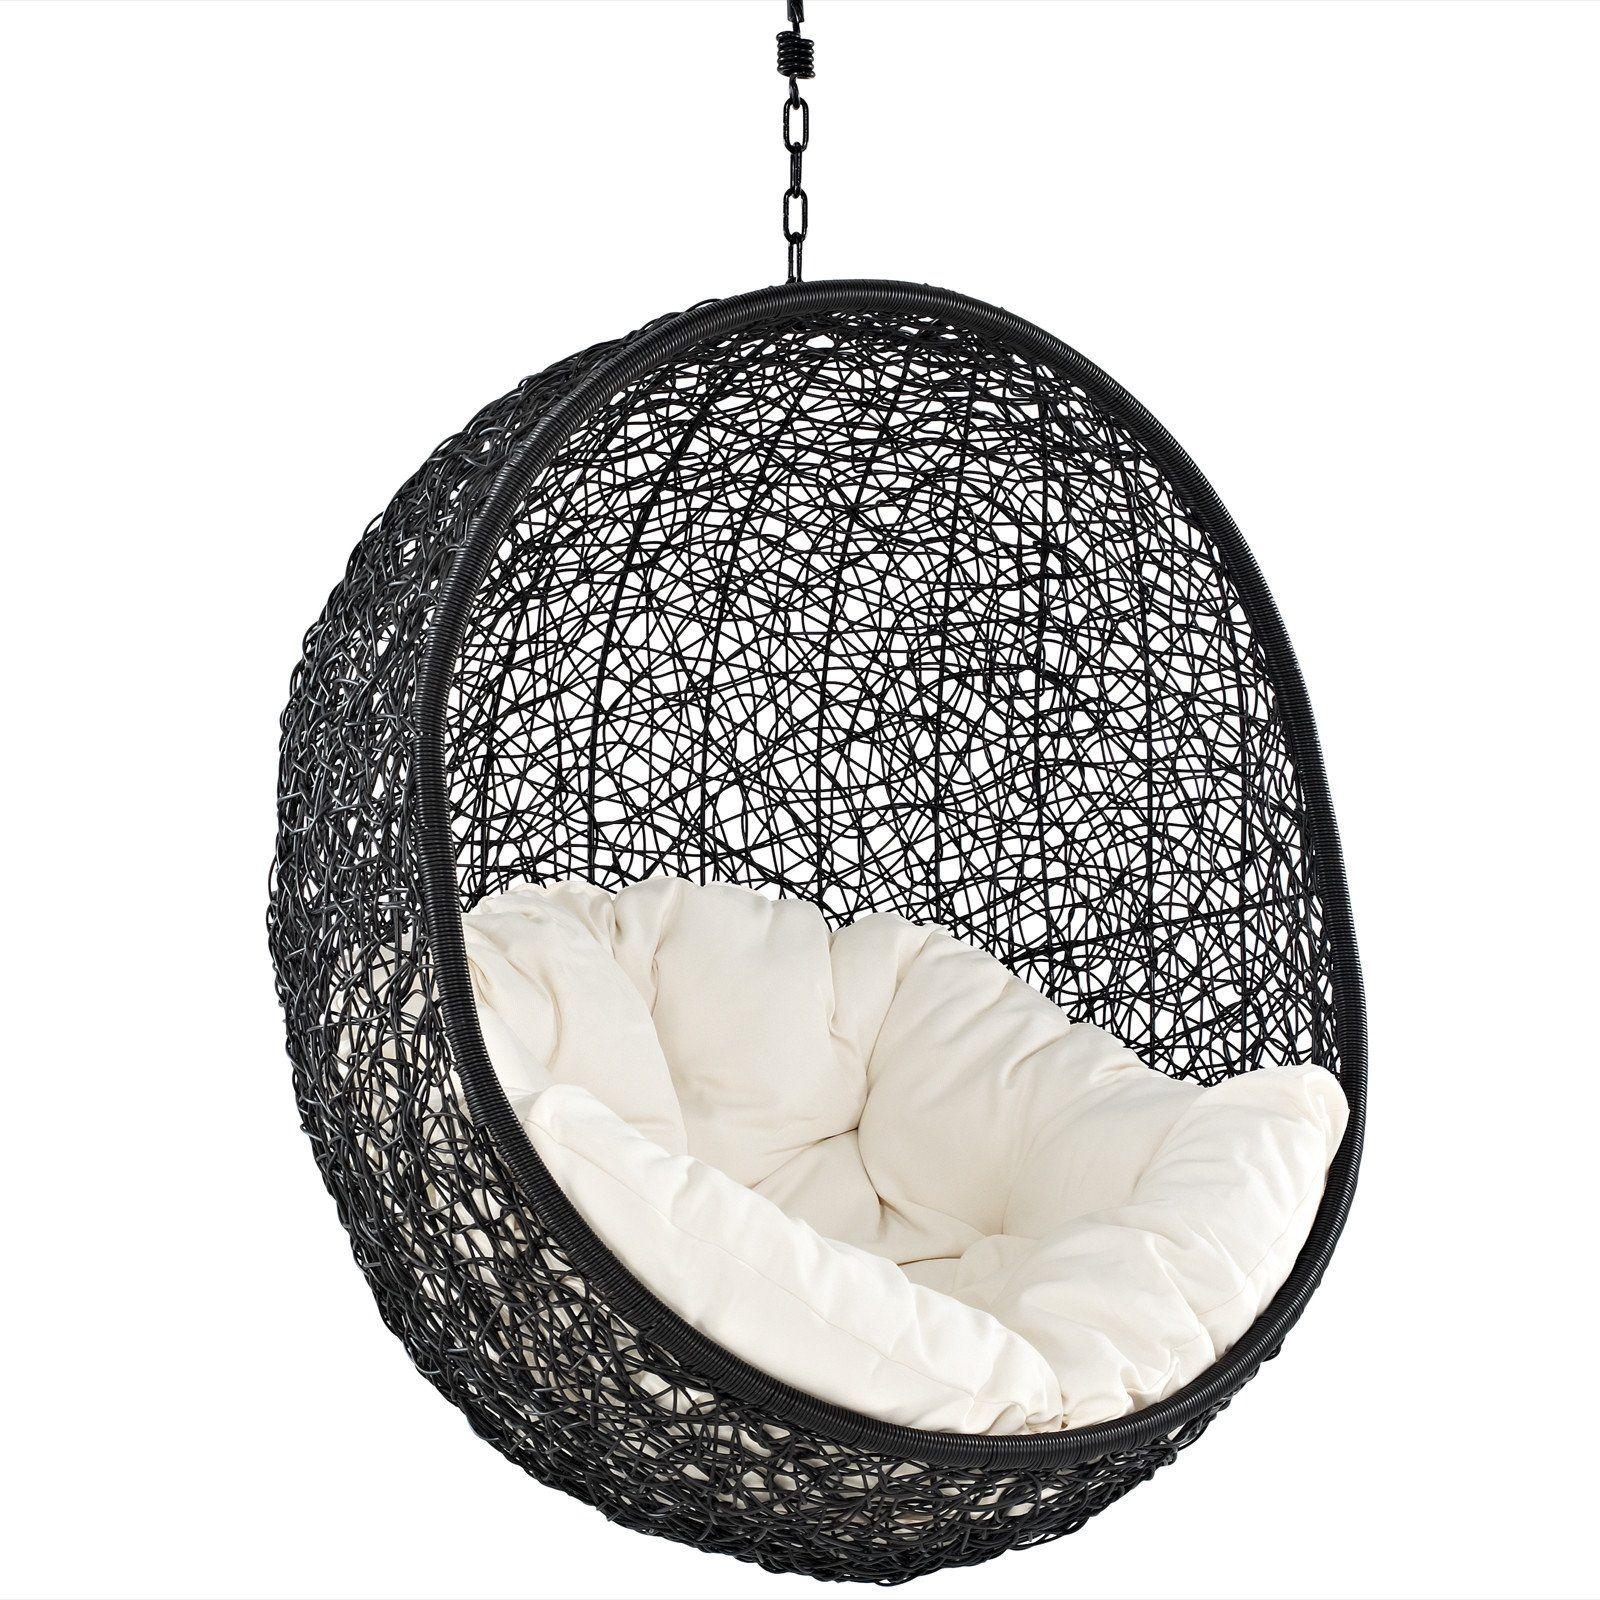 Modway furniture encase swing outdoor patio lounge chair eeiset